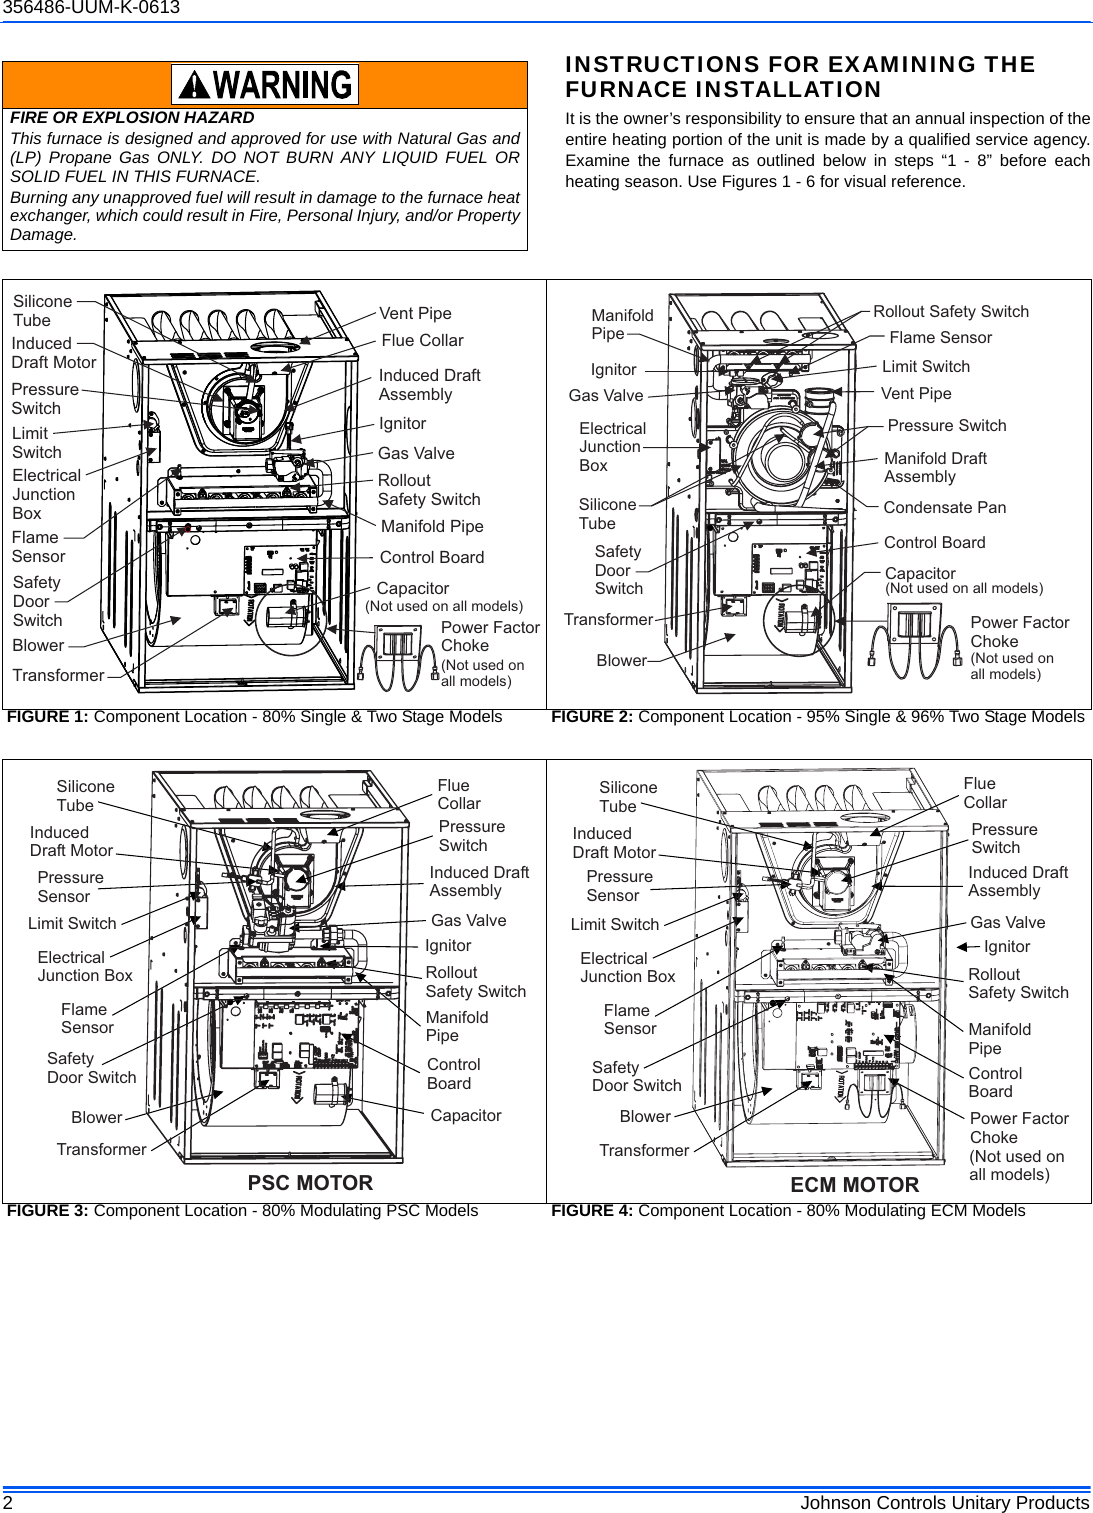 York Affinity Yp9C Furnace Owner S Manual  5979d4ce102f39ea3cf06c23826eb43fb68aa9467022f333099754389109bdb0 User | Affinity 8 Furnace Wiring Diagram S |  | UserManual.wiki